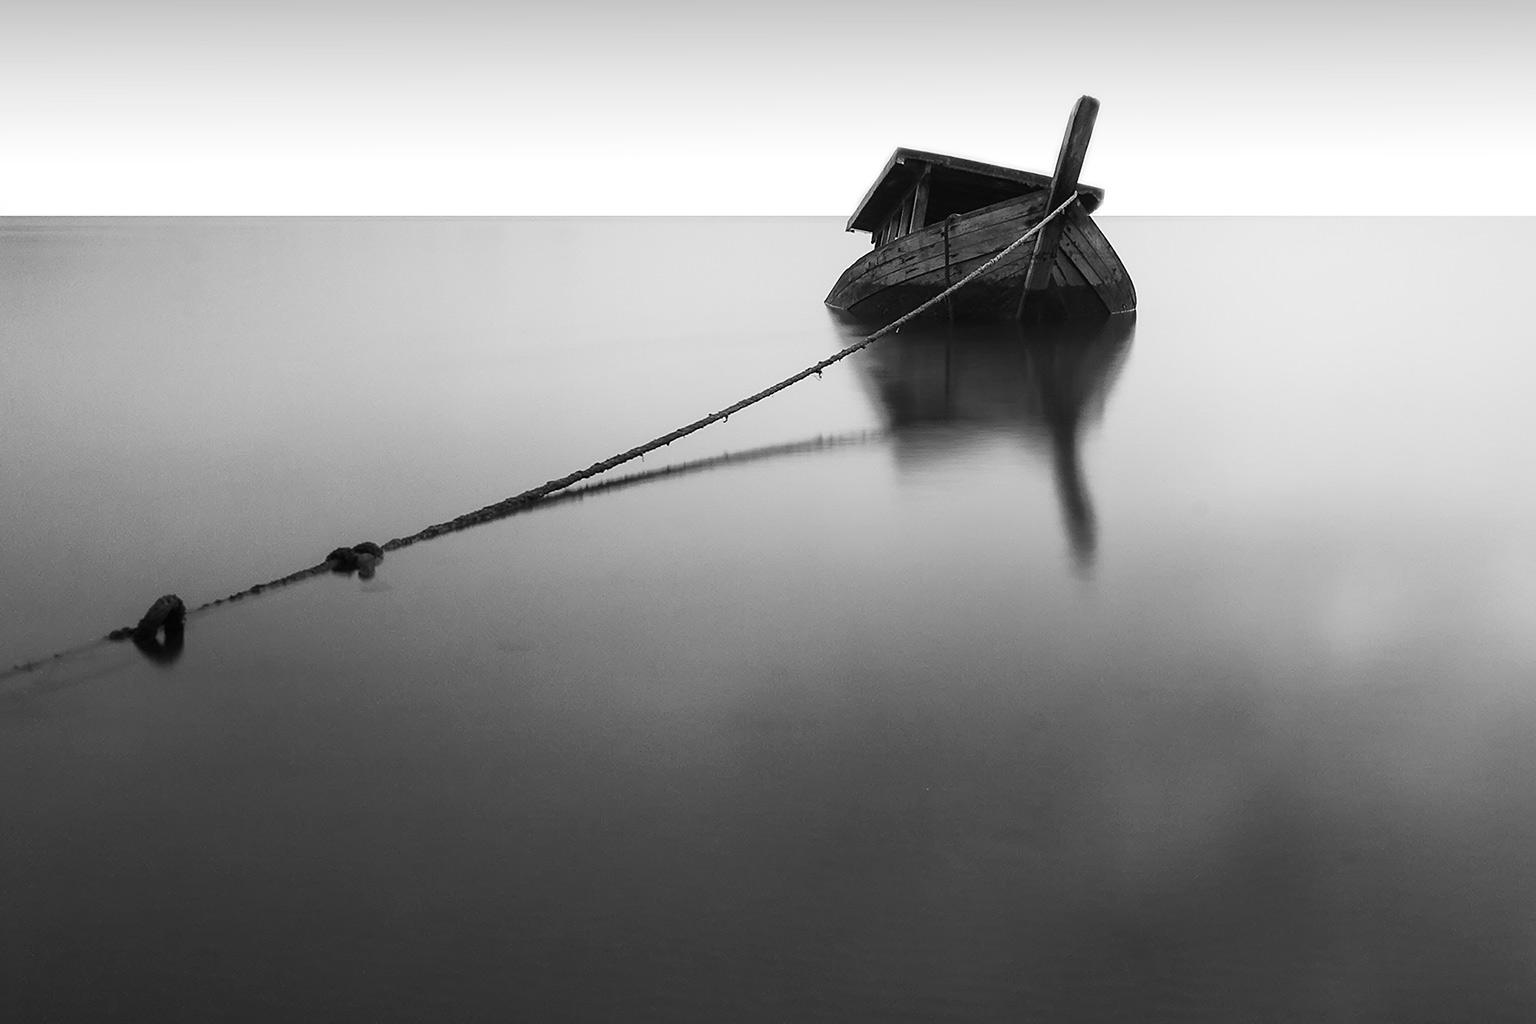 half-sunken boat at sea